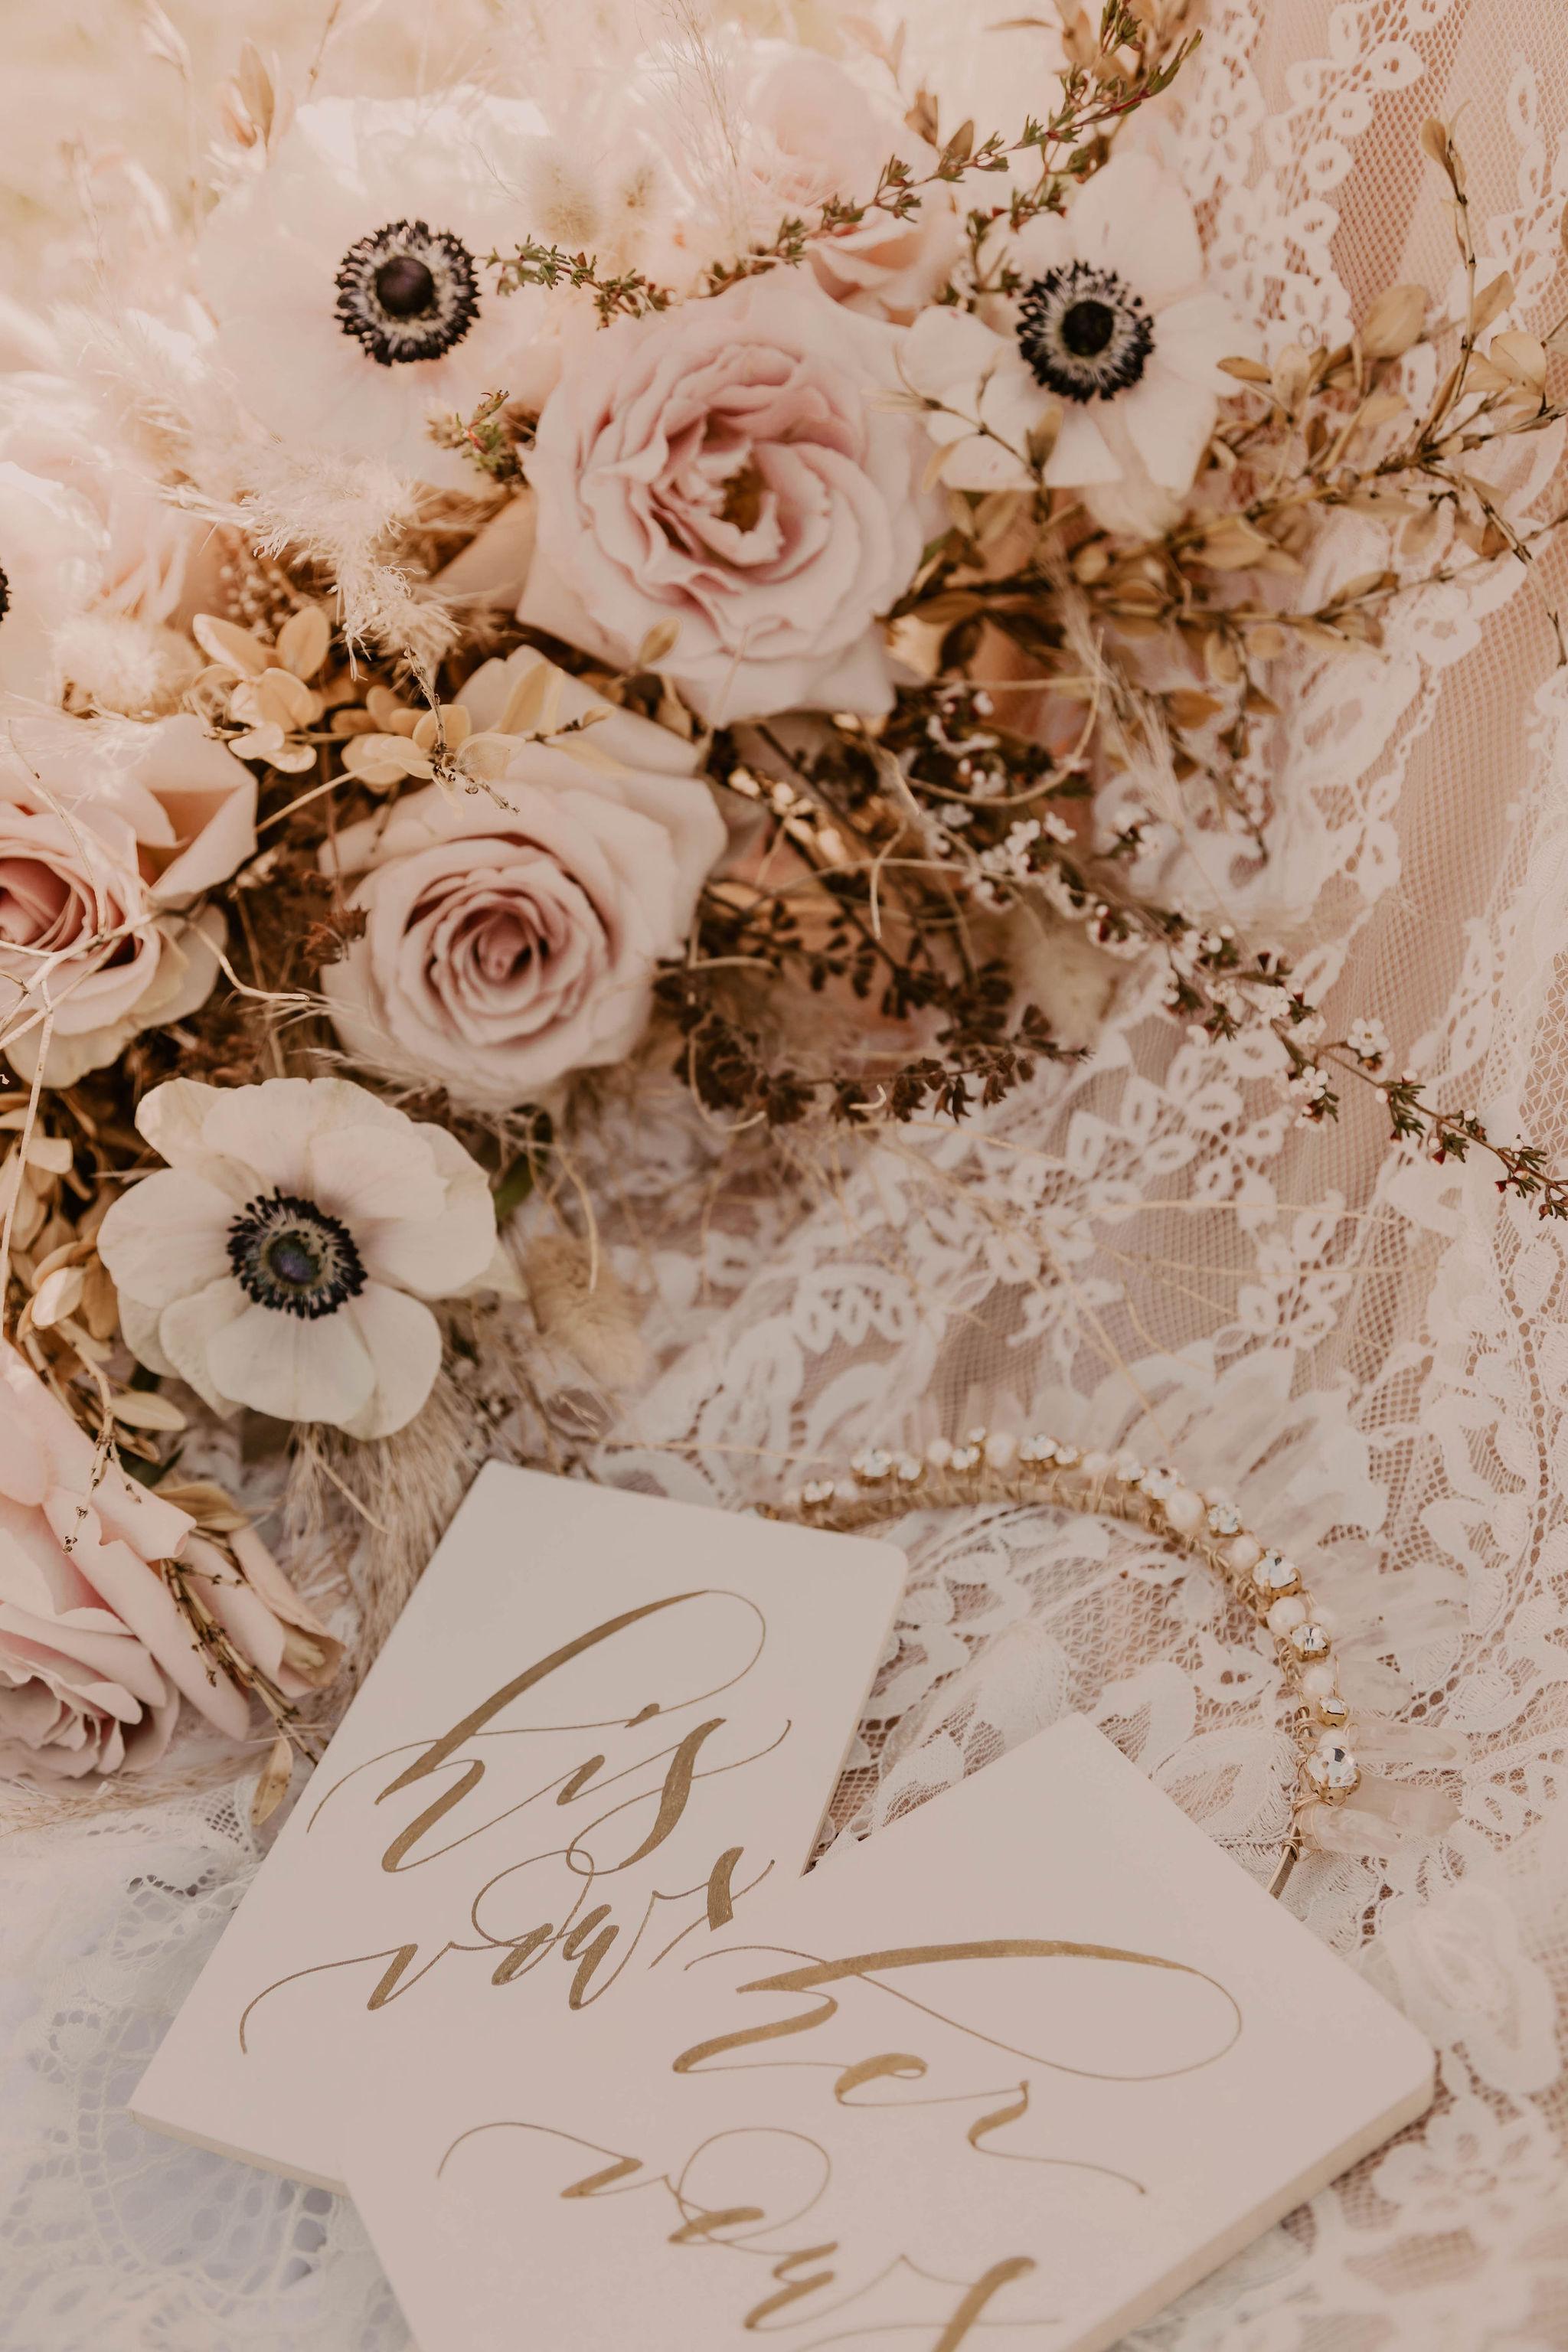 spokane wedding vow books headpiece bride